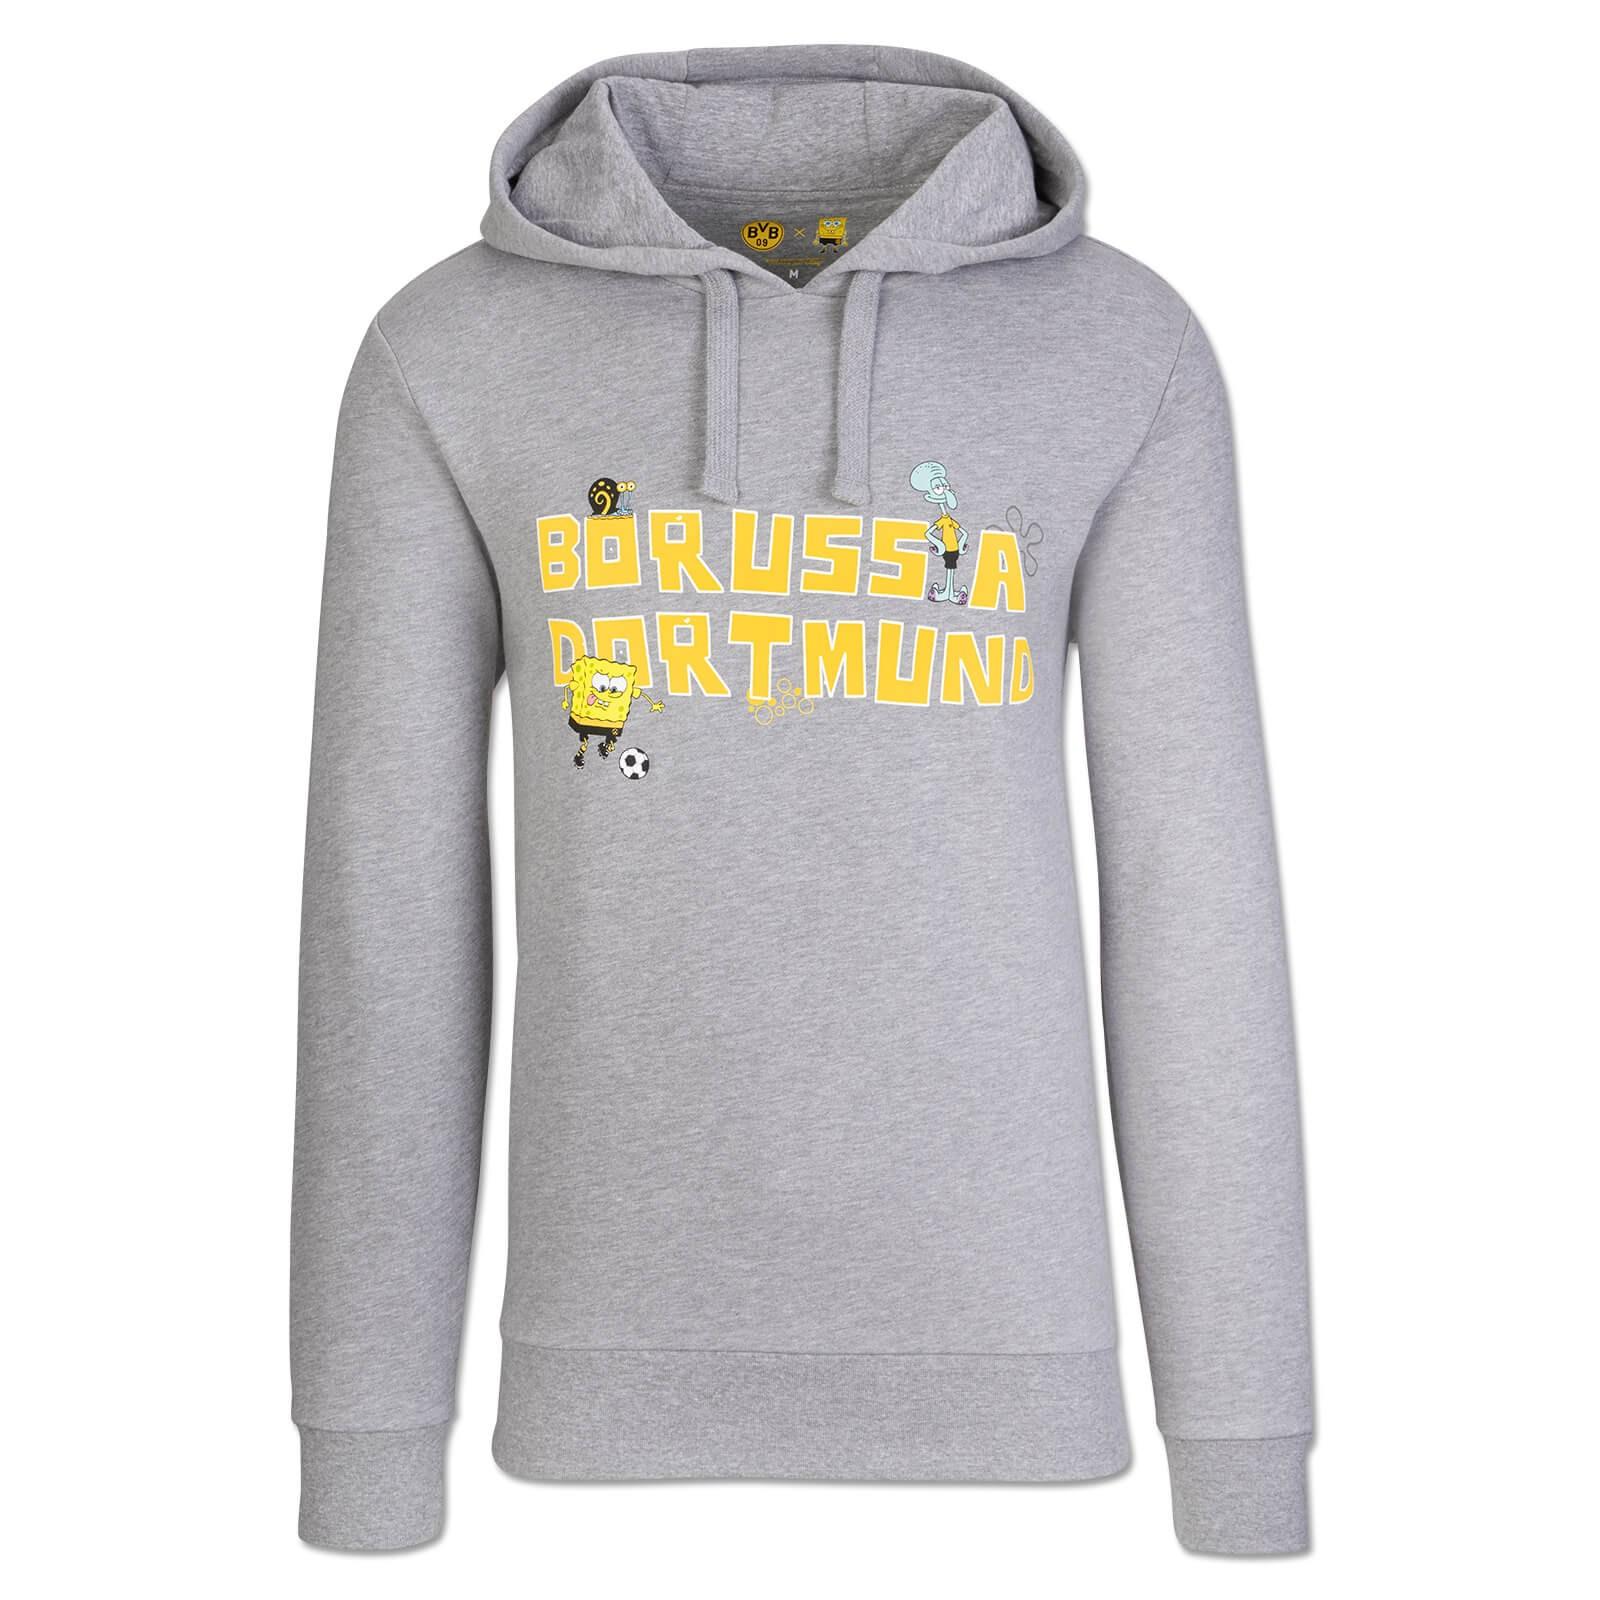 SpongeBob x Borussia Dortmund hoodie grey